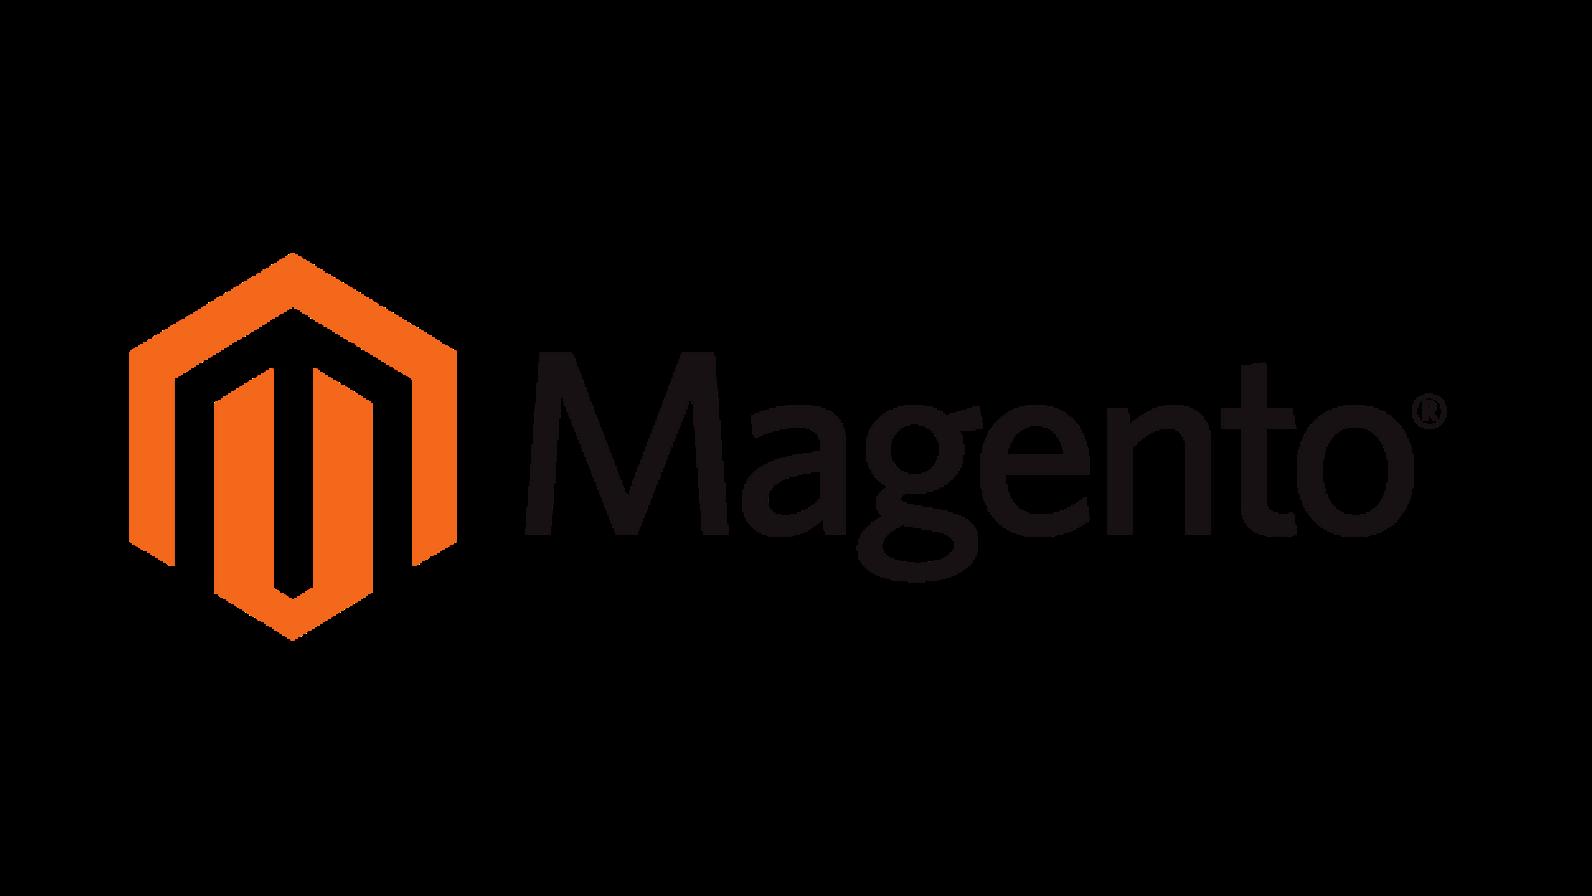 Glo-magento-logo-text